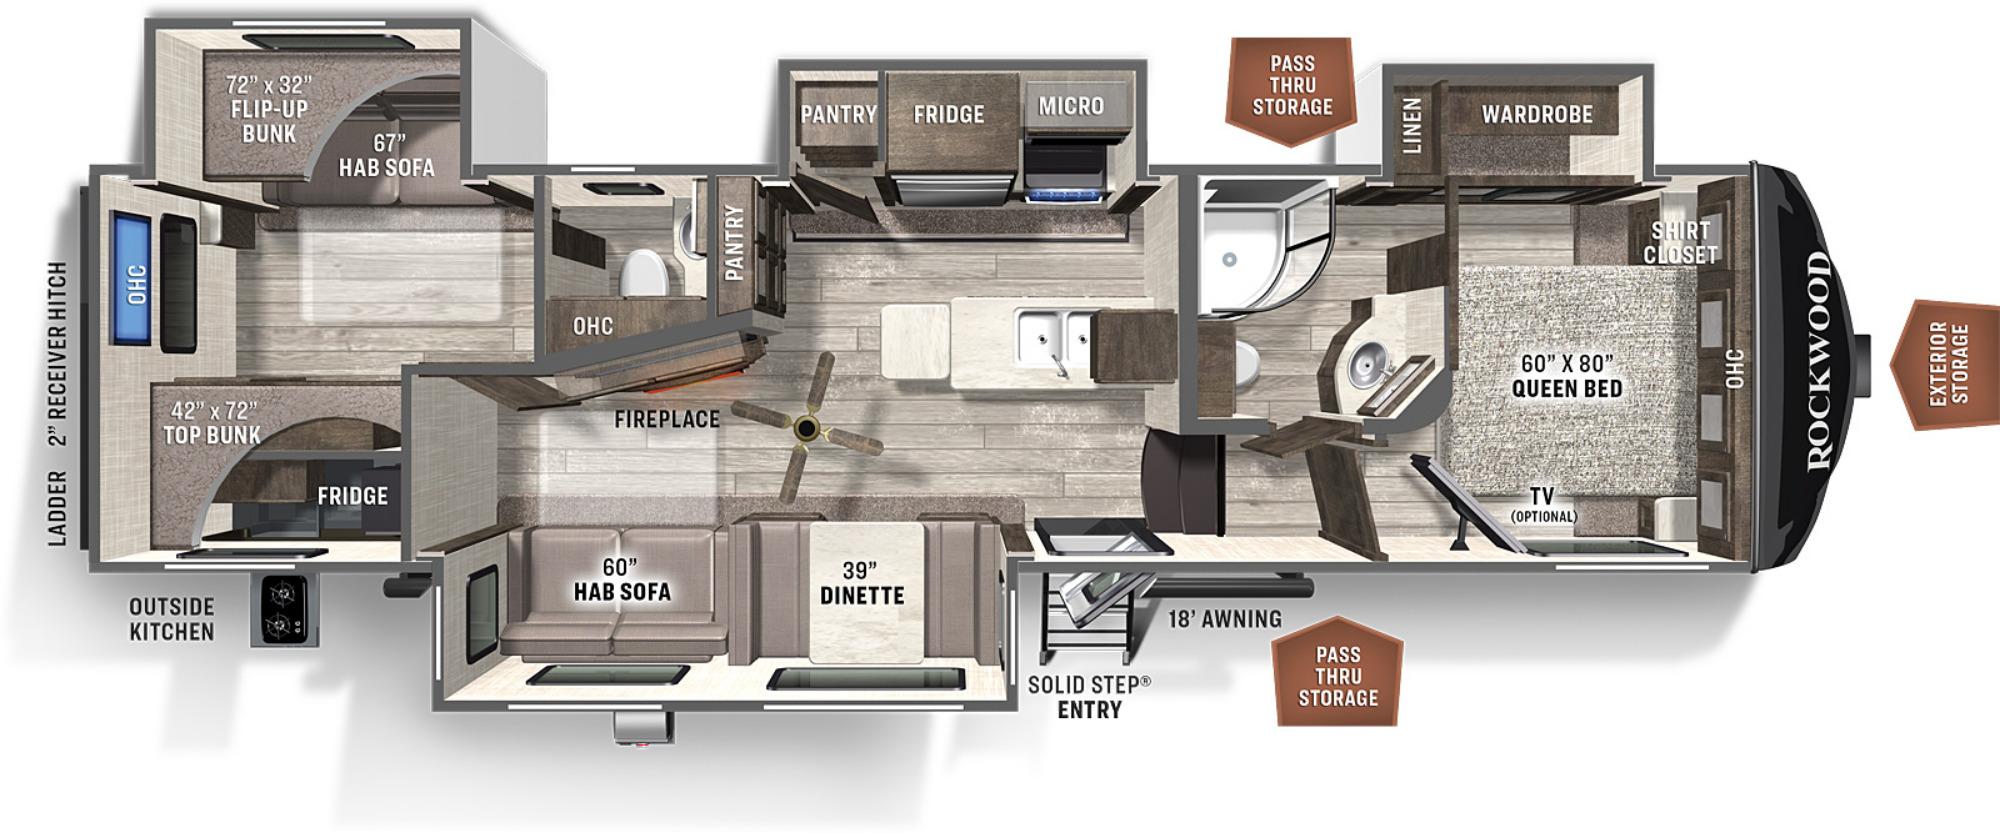 View Floor Plan for 2022 FOREST RIVER ROCKWOOD ULTRA LITE 2892RB